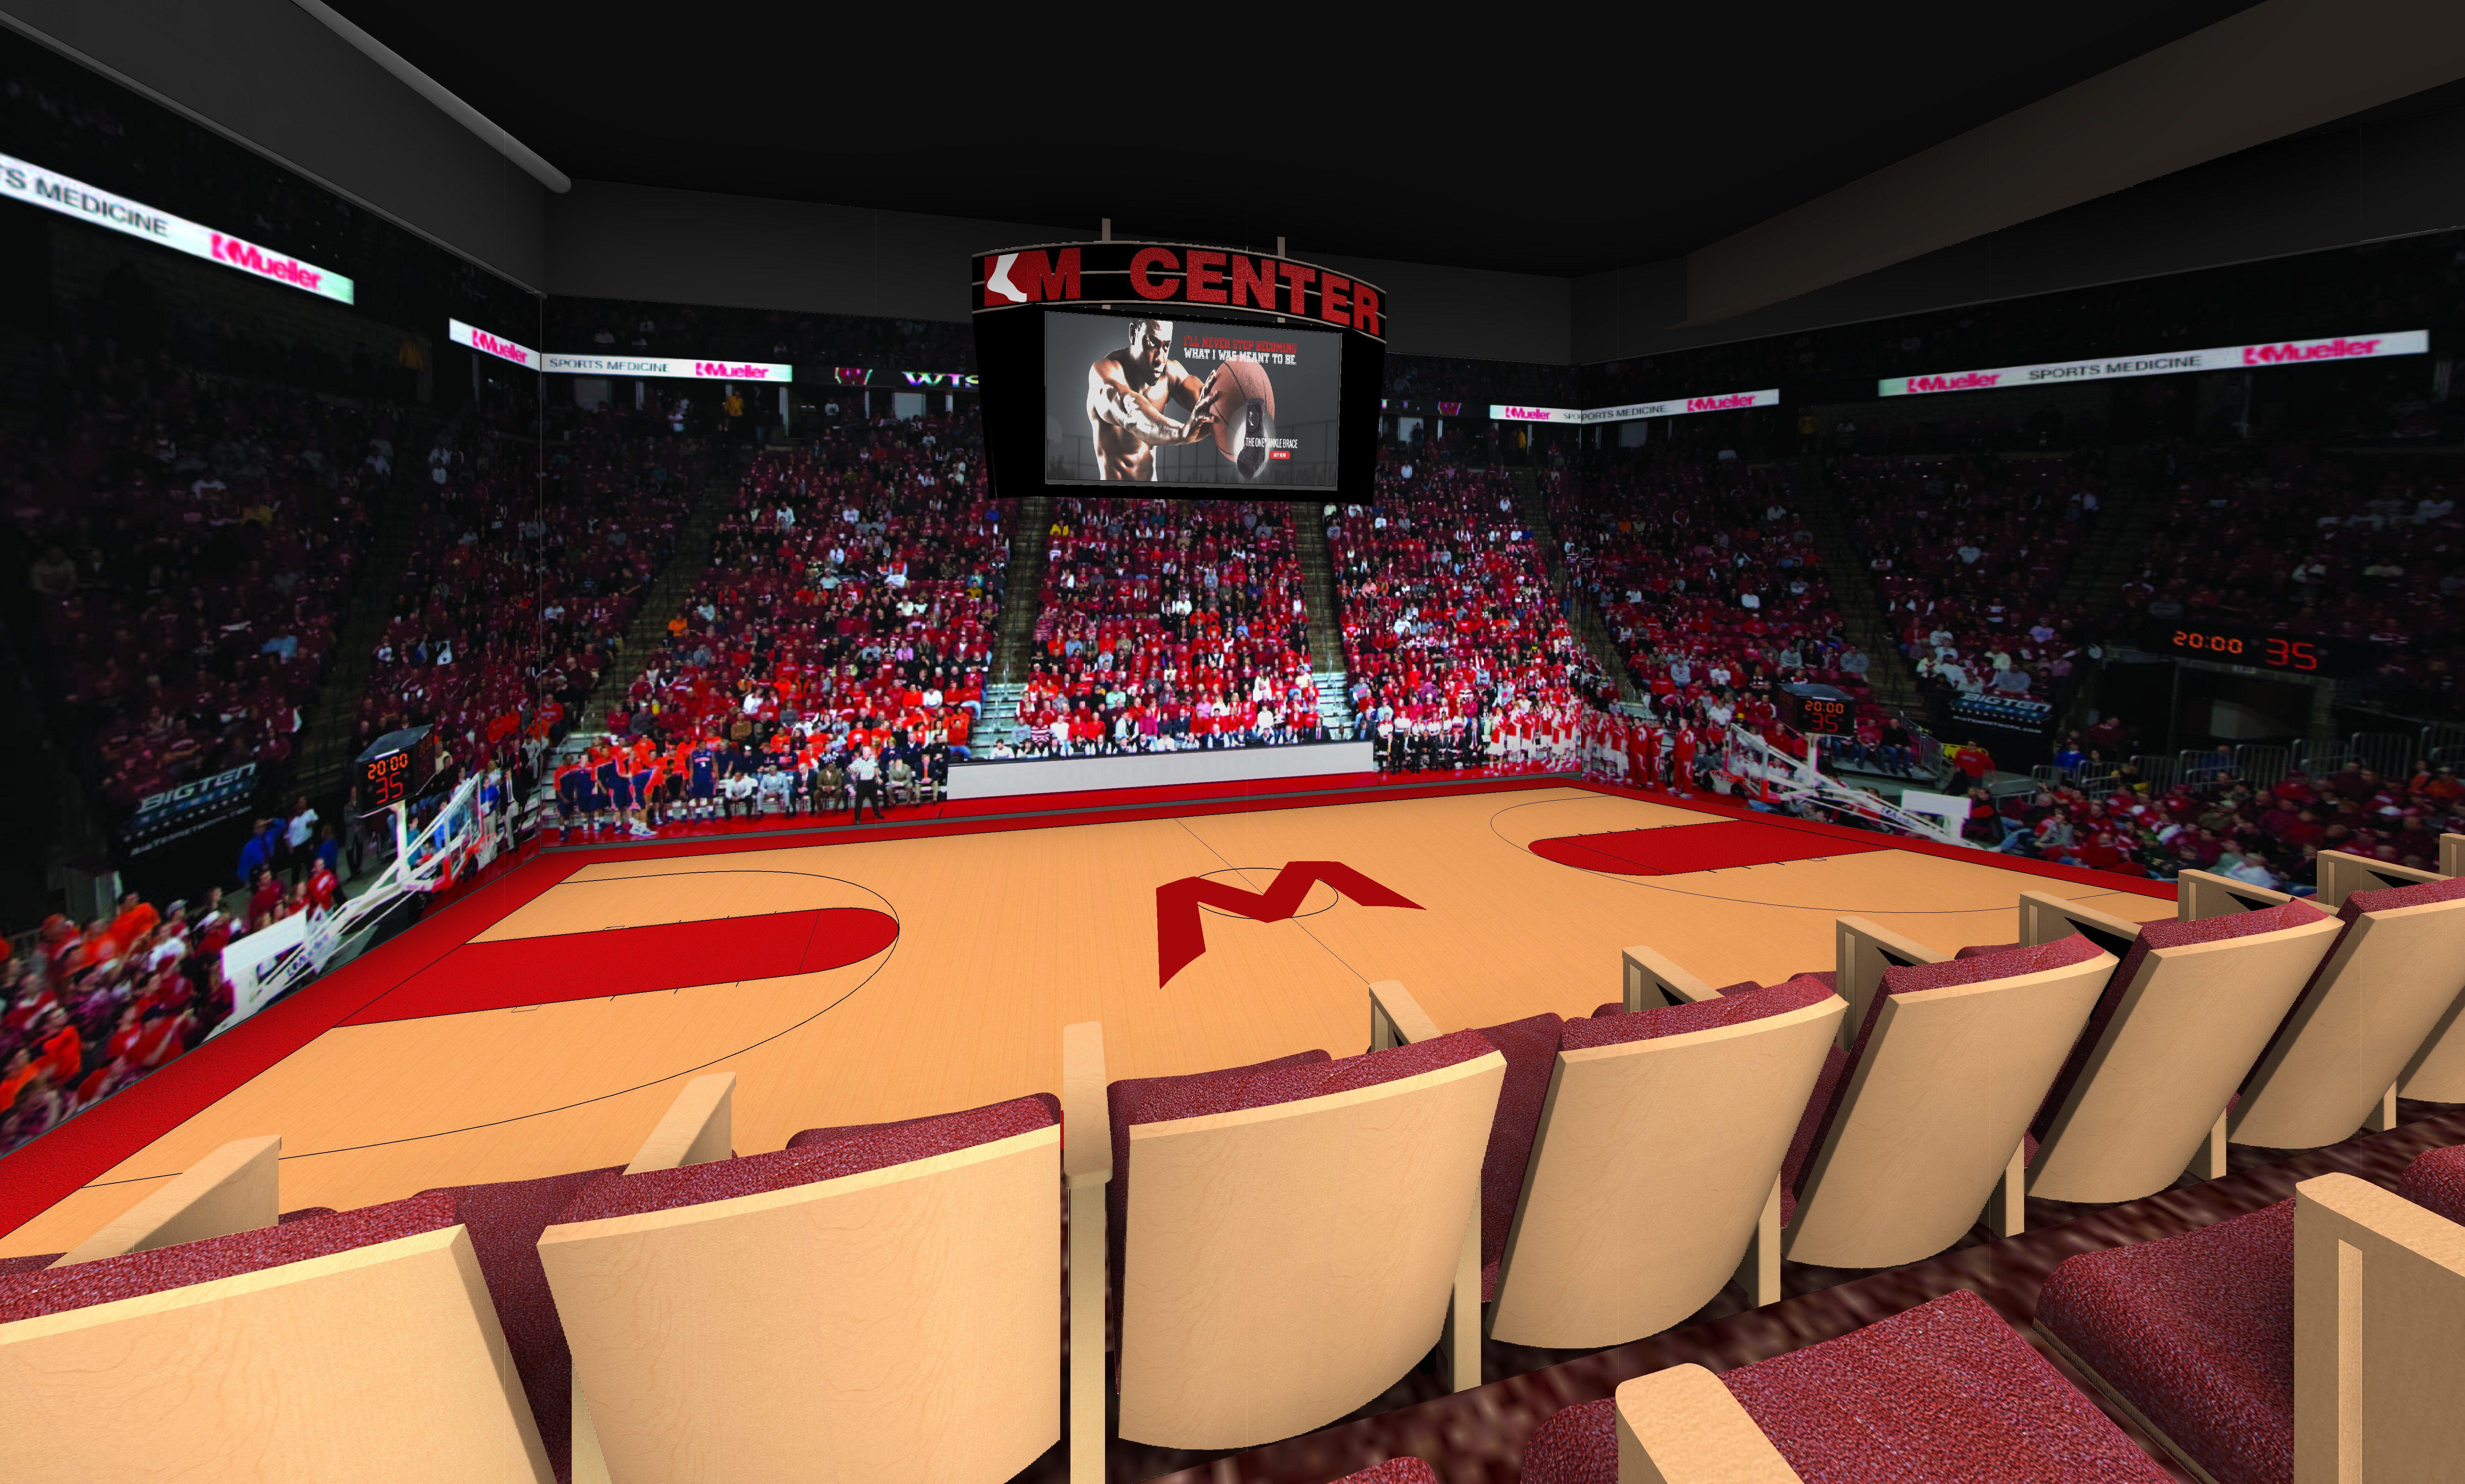 M Center Court